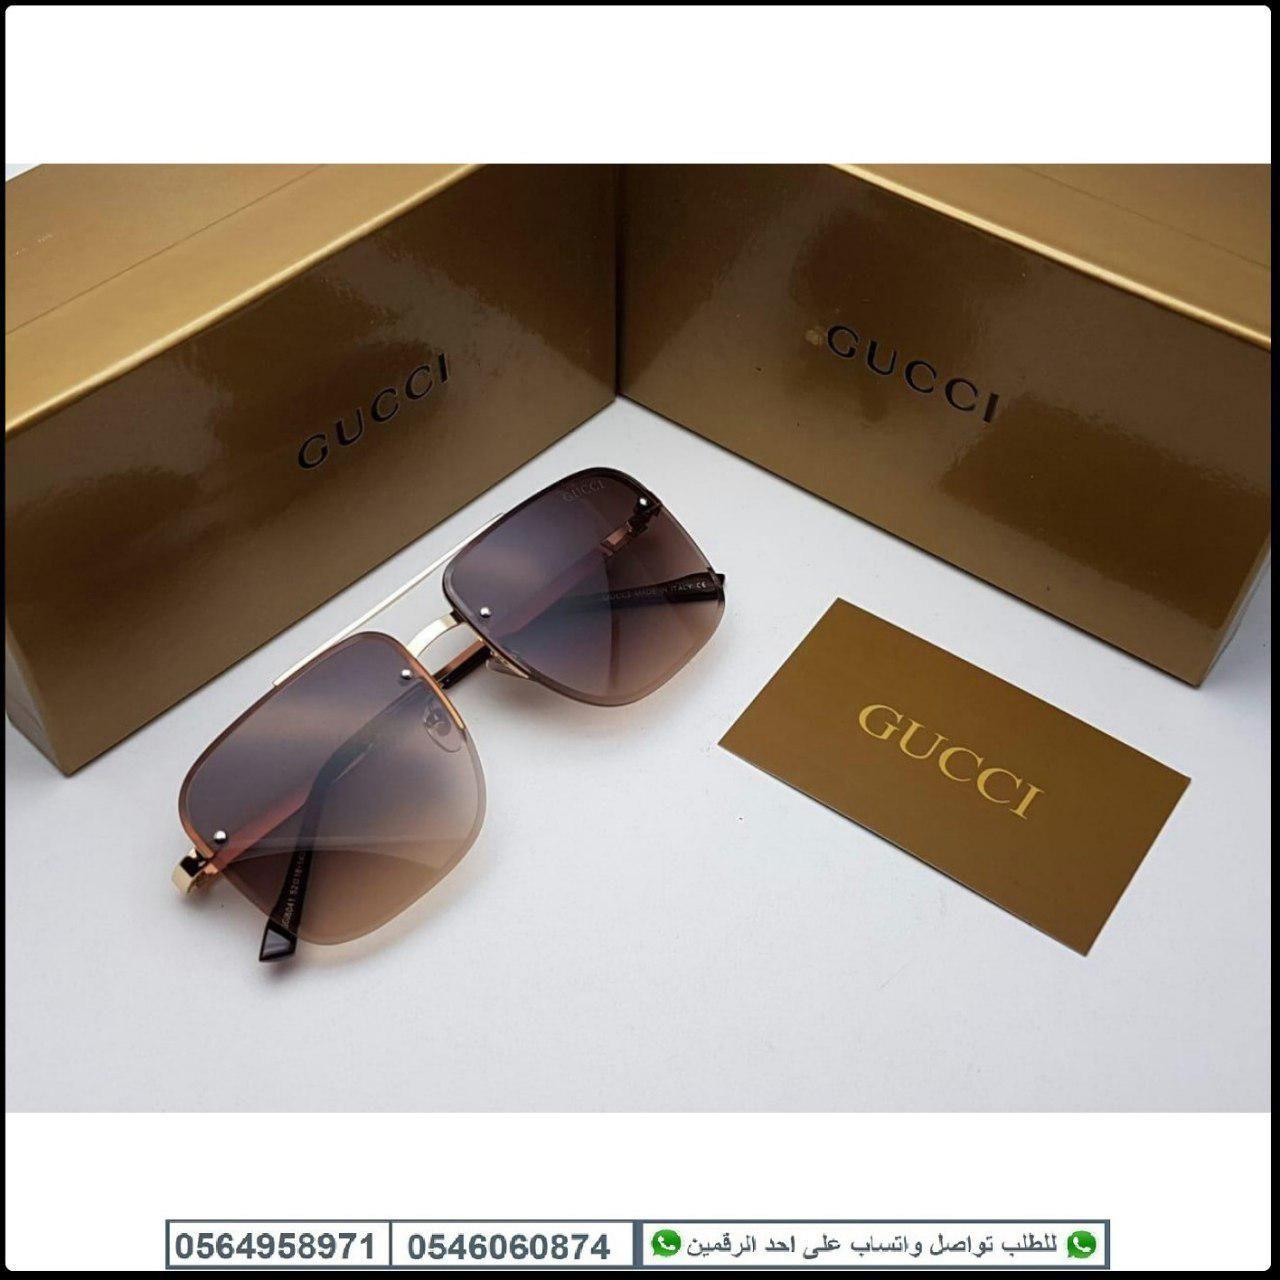 نظارات قوتشي رجالي Gucci مع جميع الملحقات و بنفس اسم الماركه هدايا هنوف Gucci Square Sunglass Sunglasses